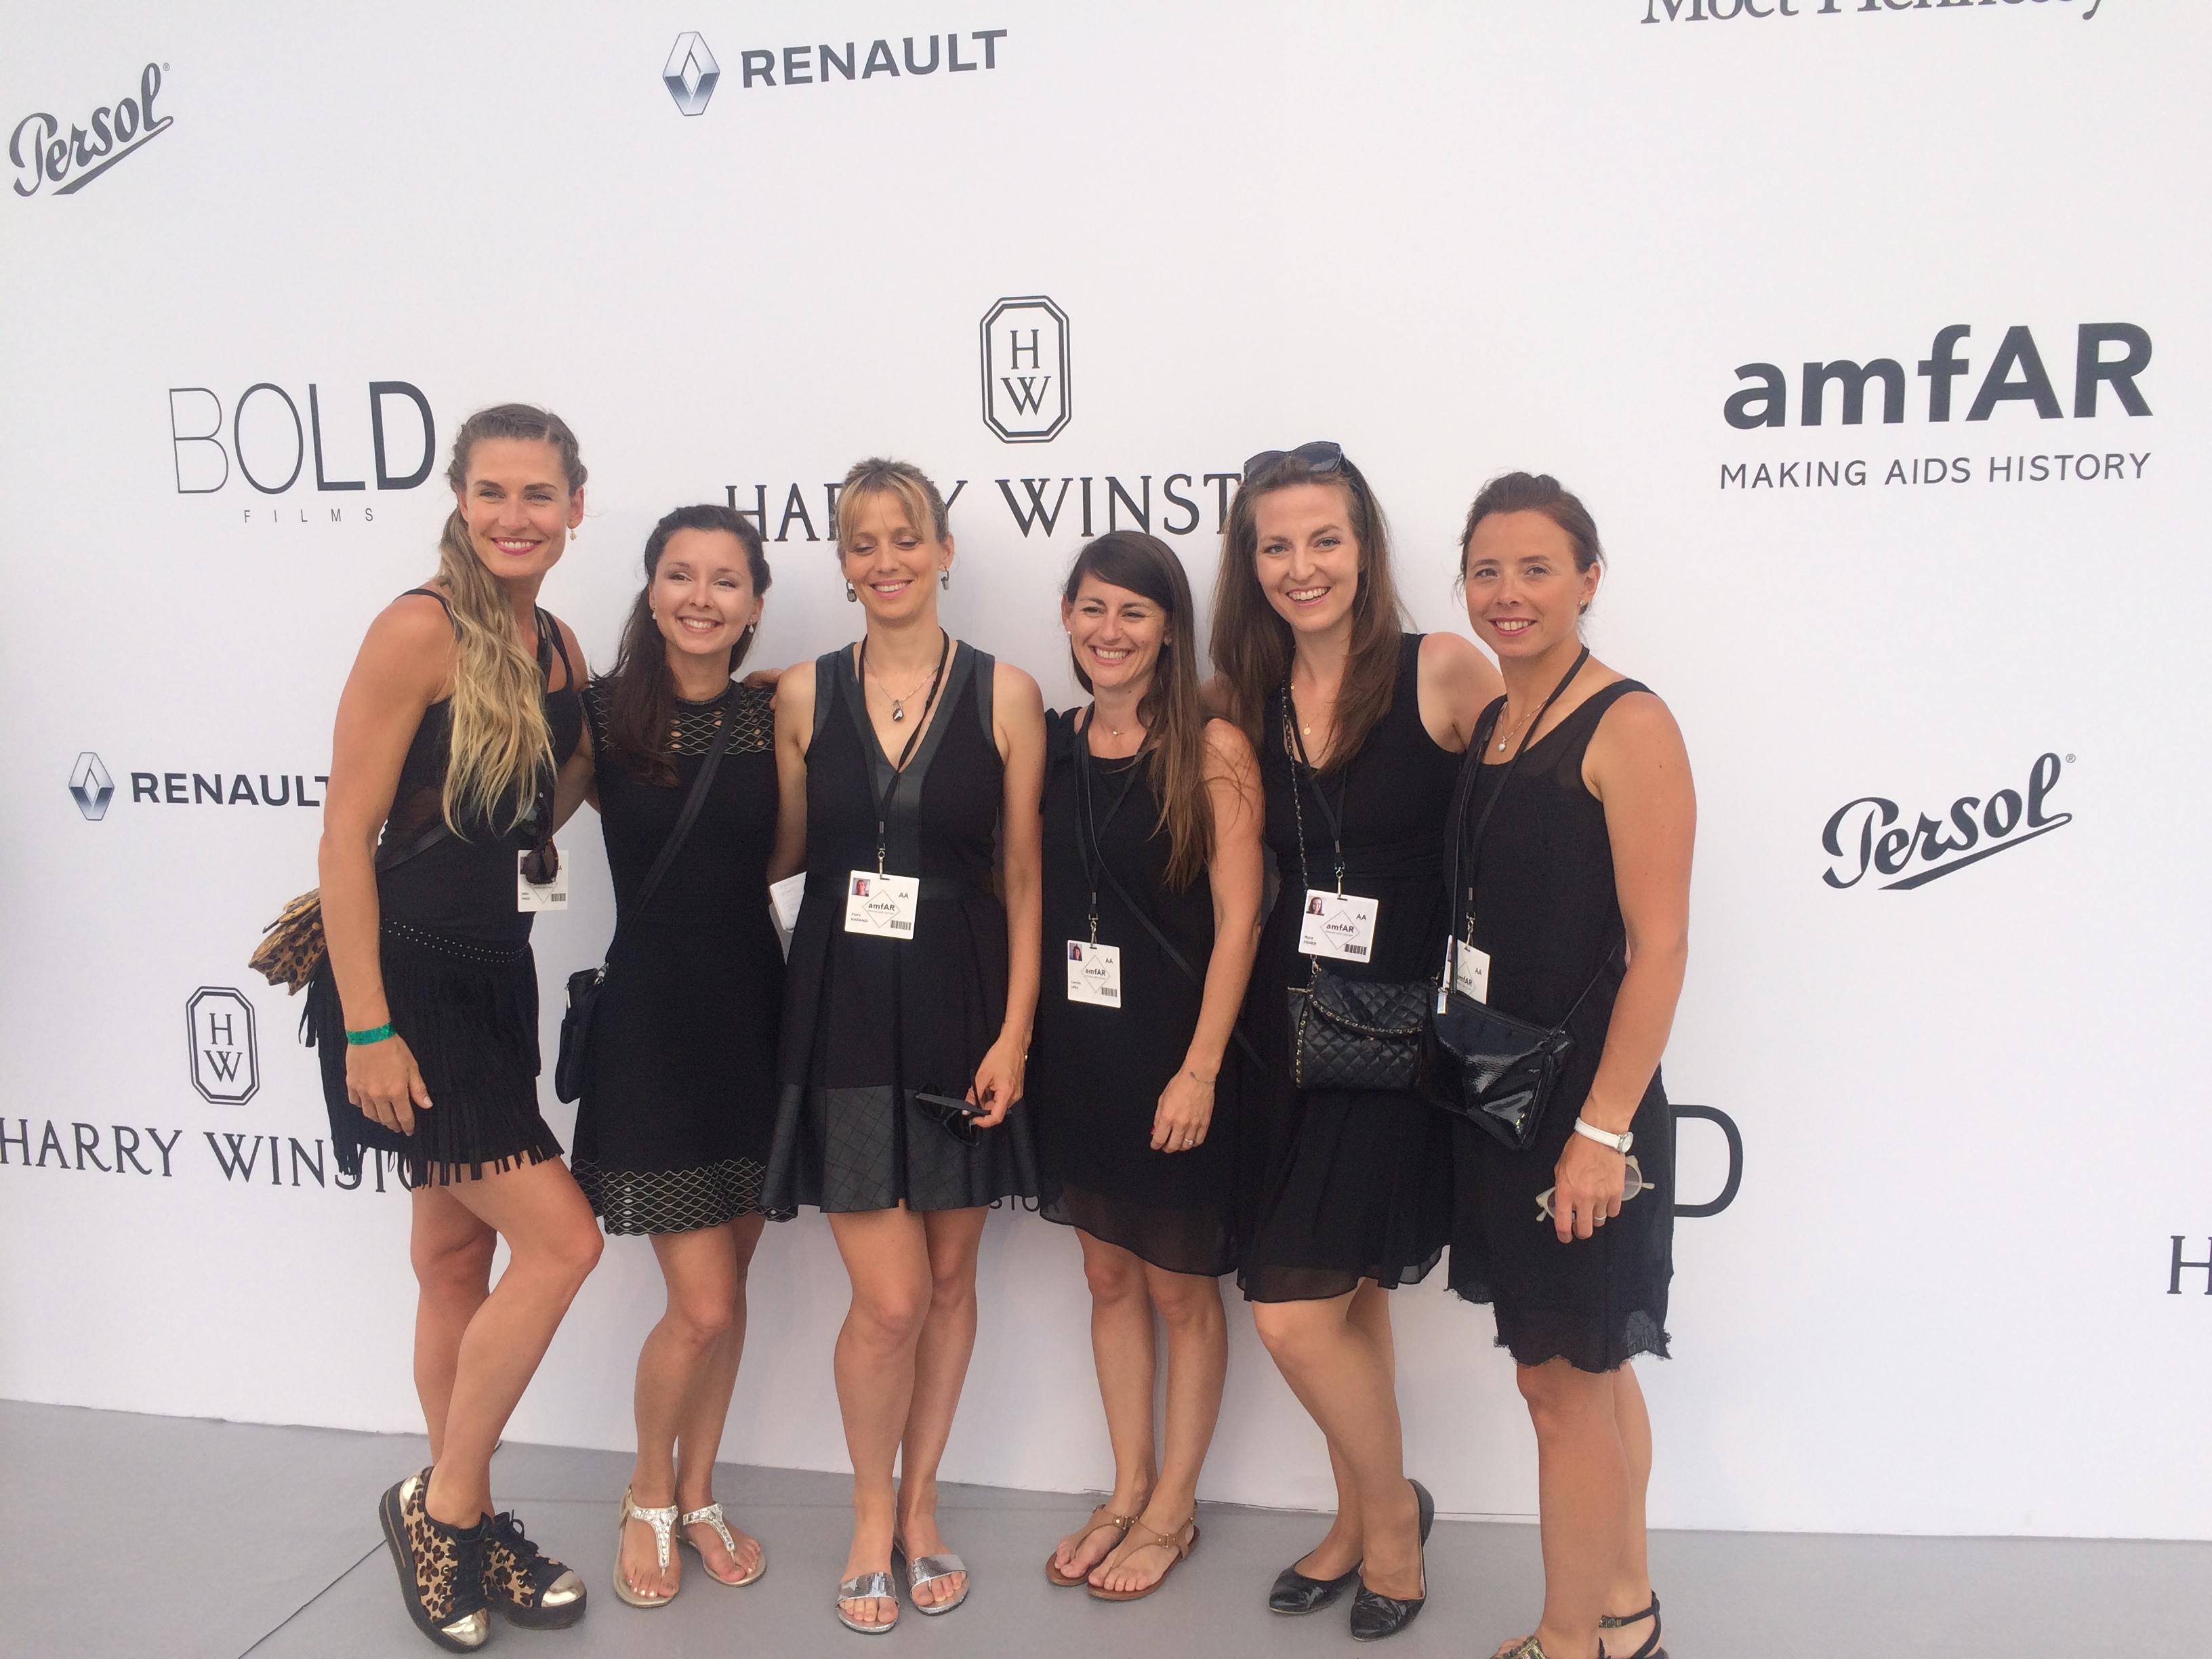 amfAR charity gala hostesses 2017